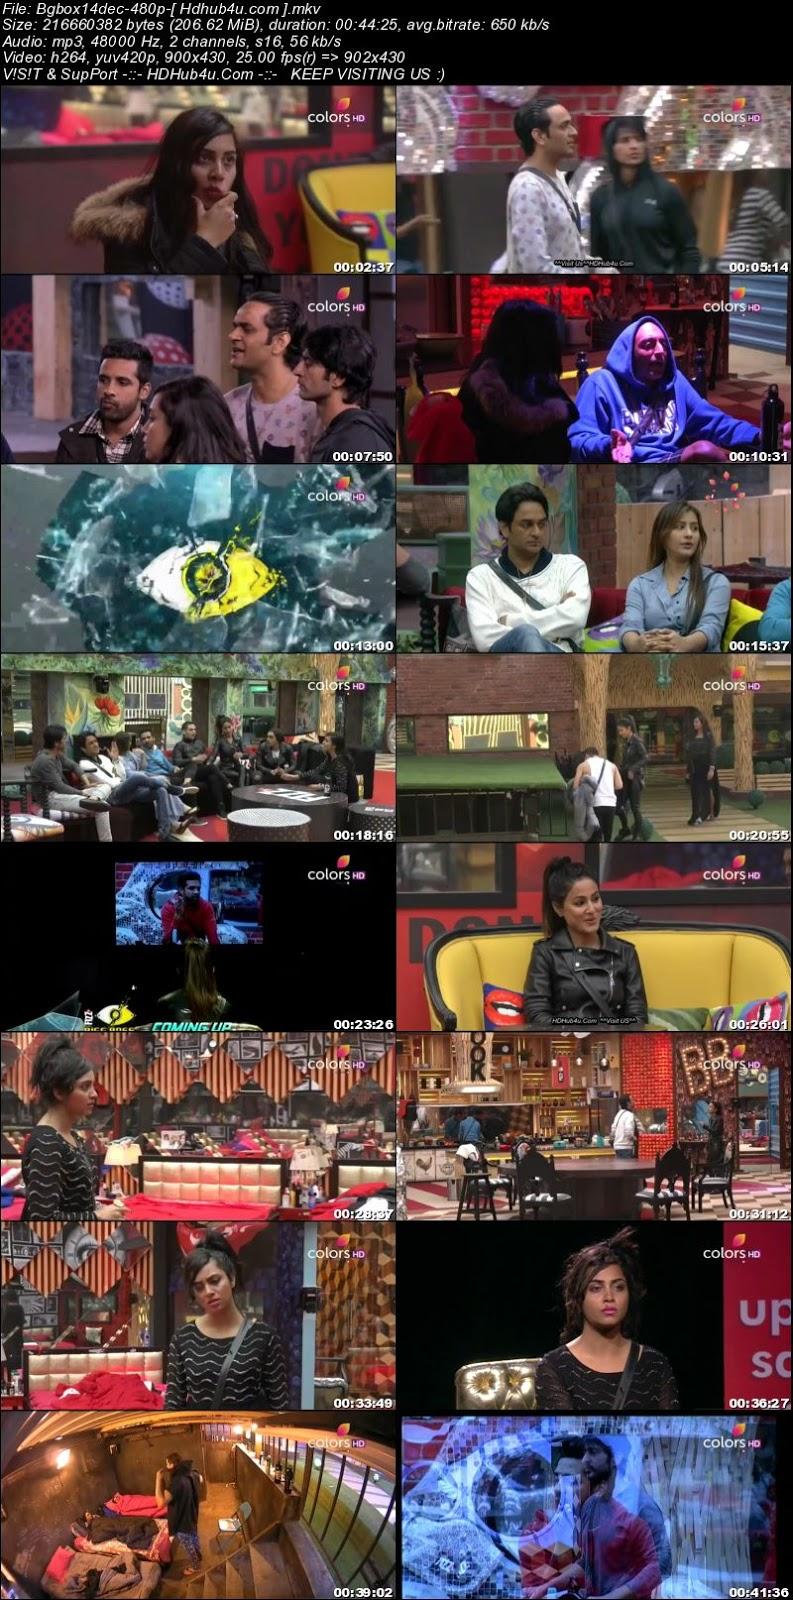 Bigg Boss S11E75 14th December 2017 HDTV 480p 200MB Download